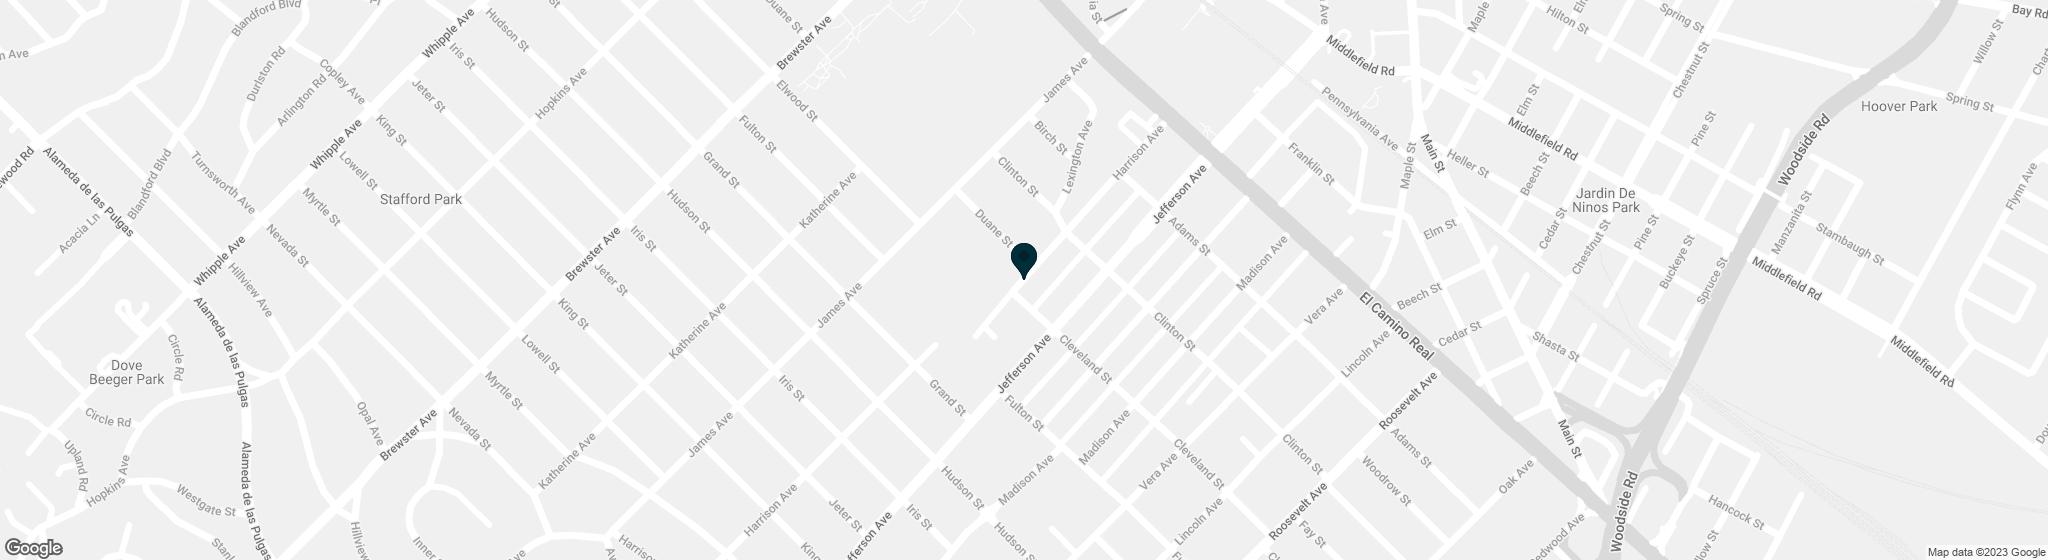 453 Harrison Ave. Redwood City CA 94062